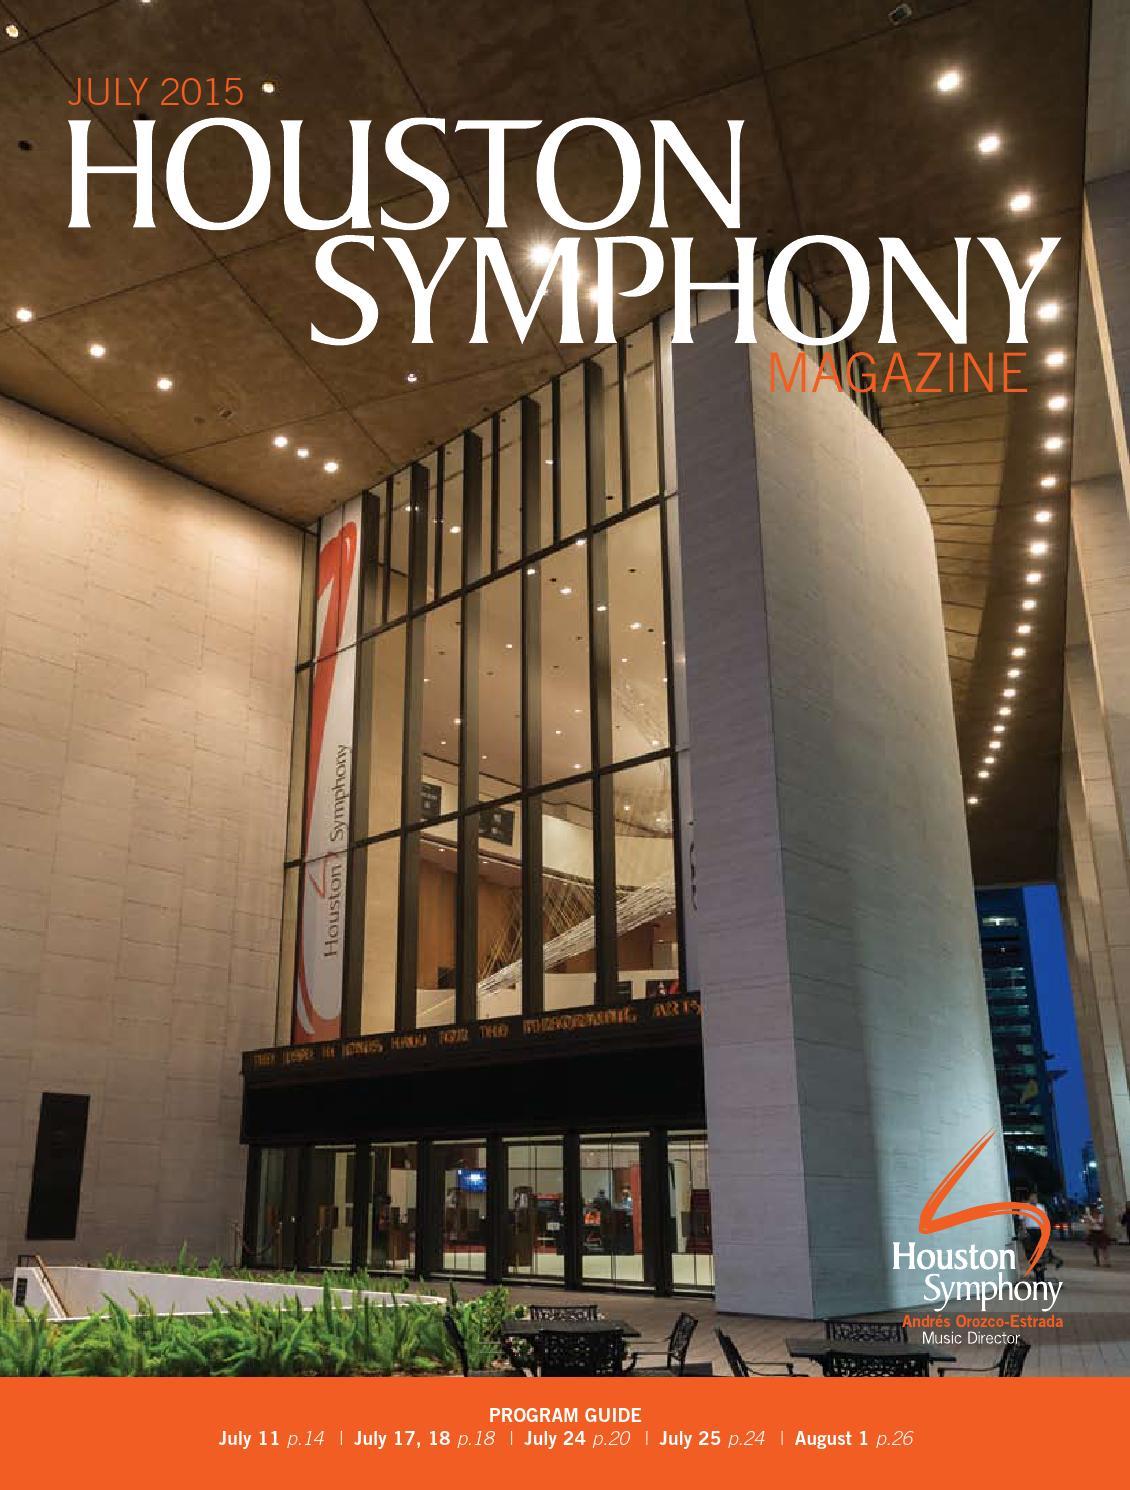 houston symphony magazine july 2015 by houston symphony issuu